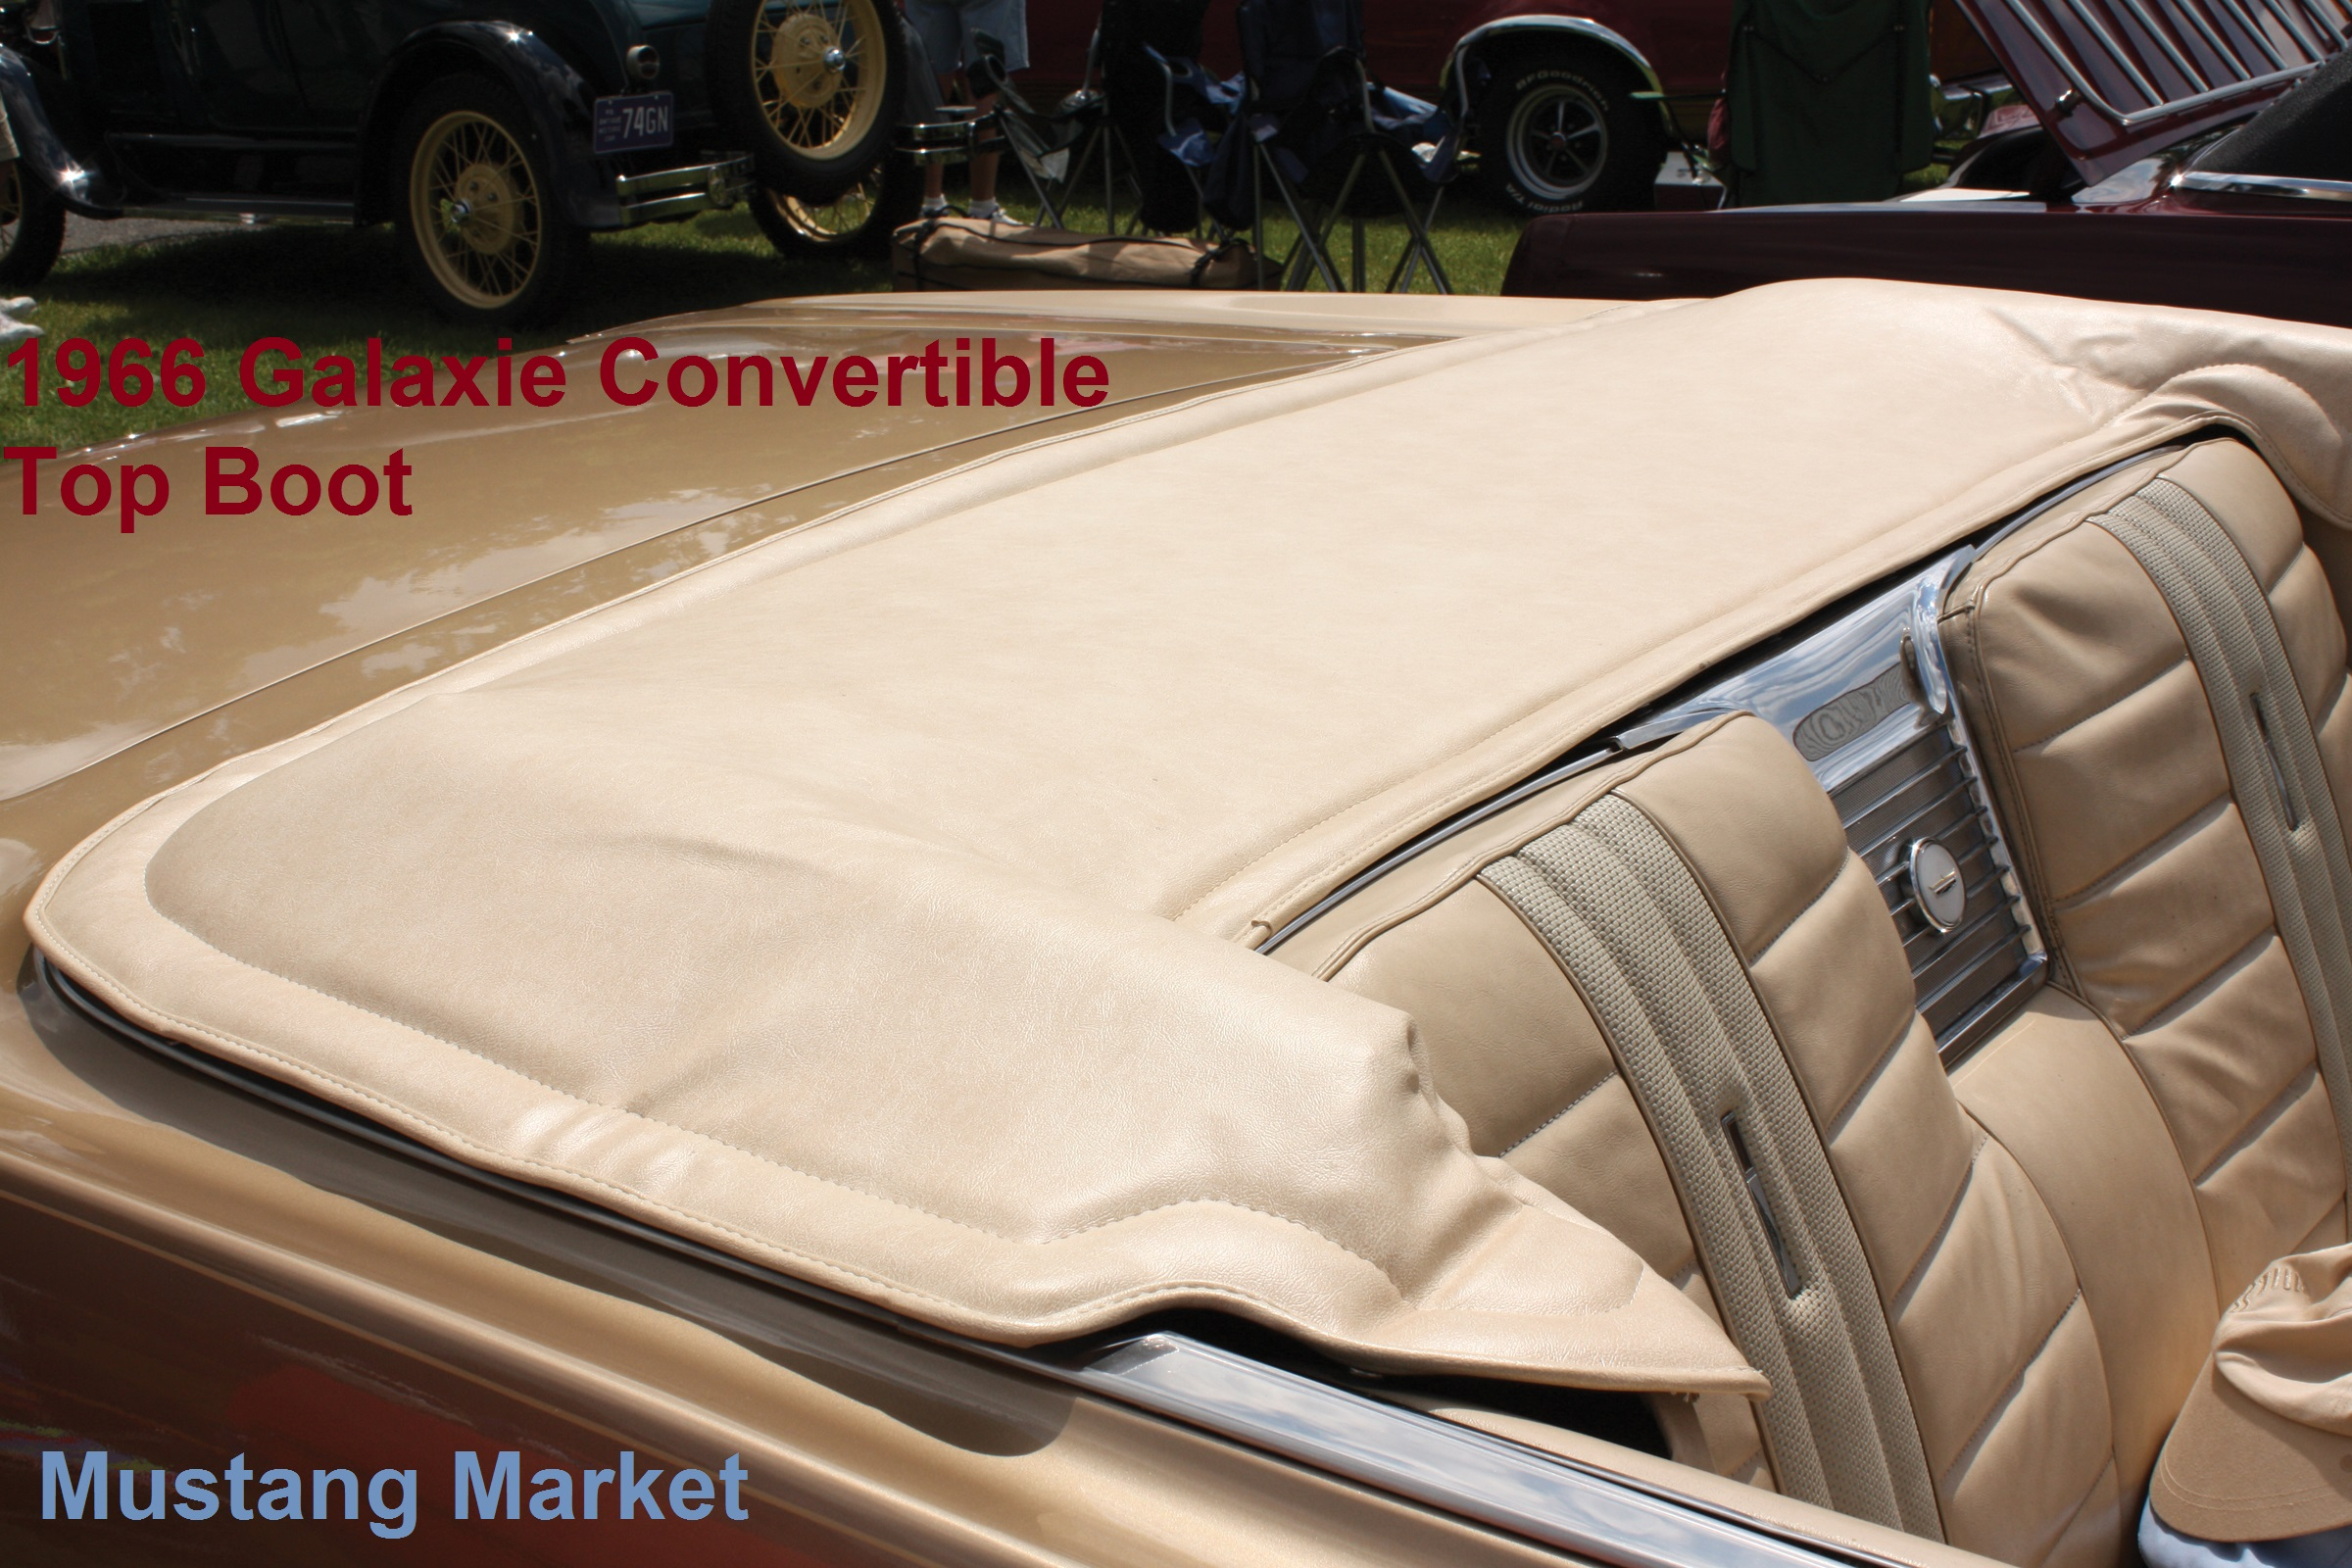 1966 galaxie convertible top boot publicscrutiny Choice Image